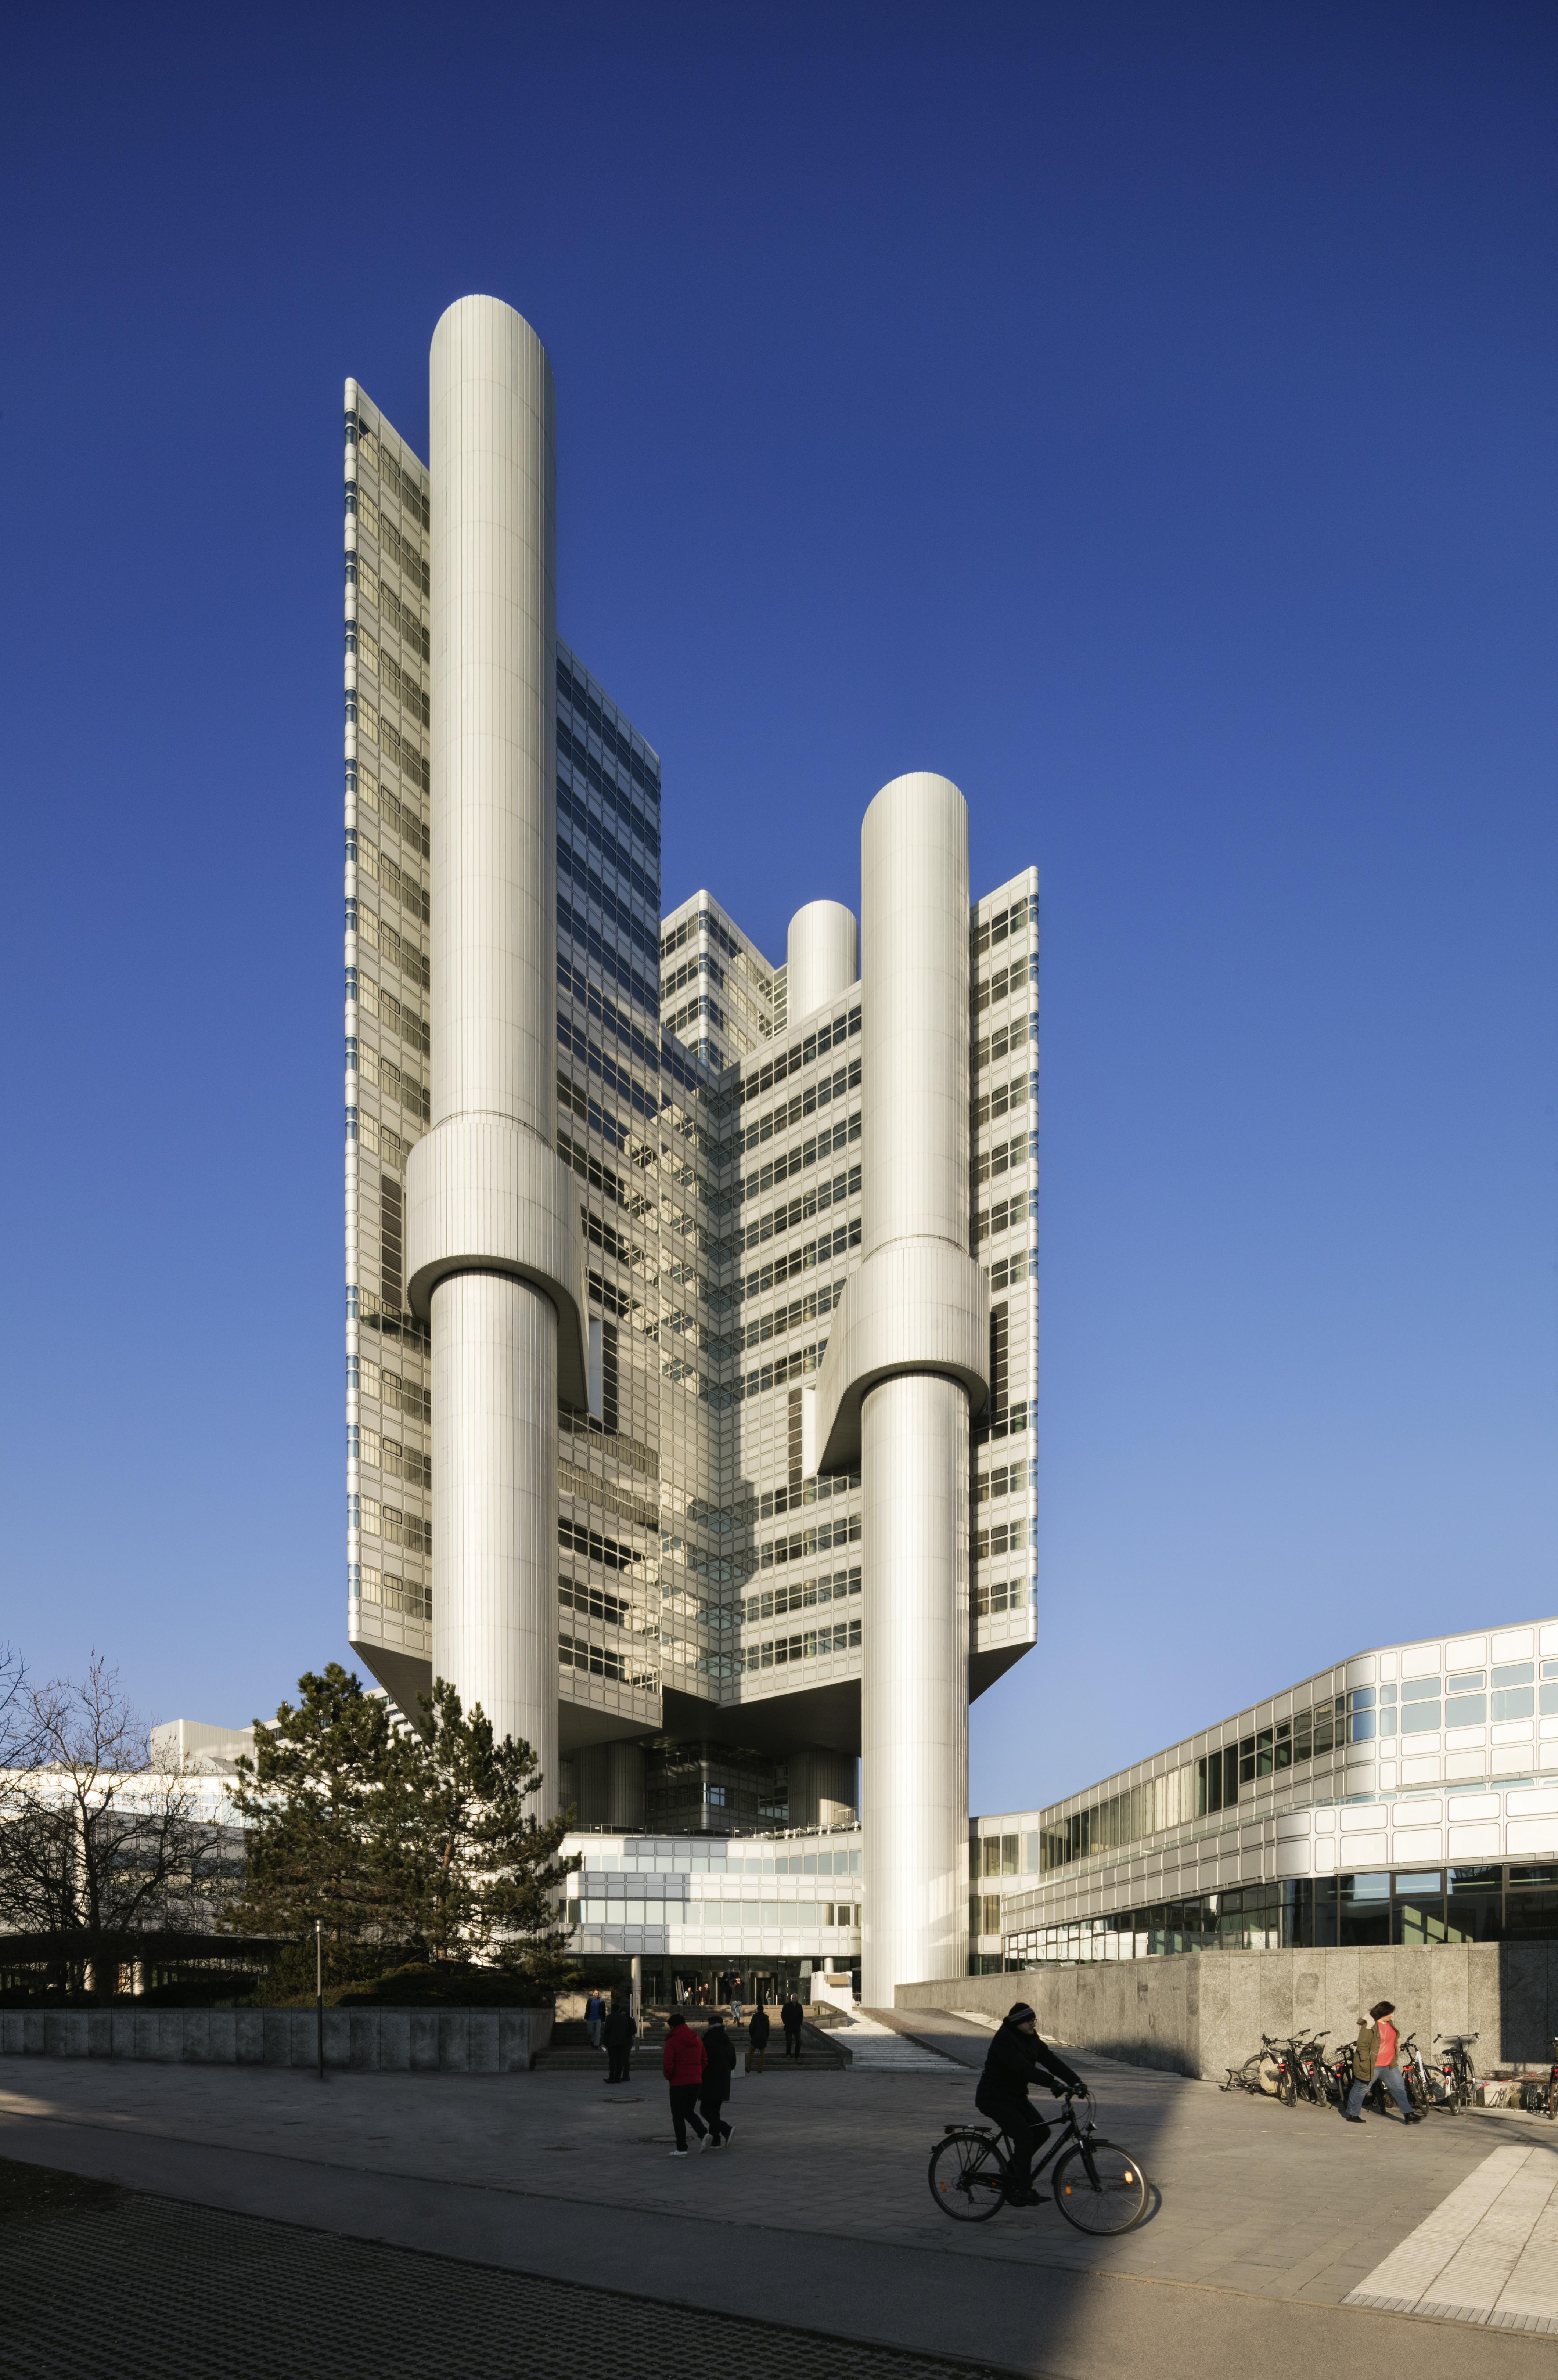 https://upload.wikimedia.org/wikipedia/commons/2/29/HVB-Tower_in_M%C3%BCnchen.jpg